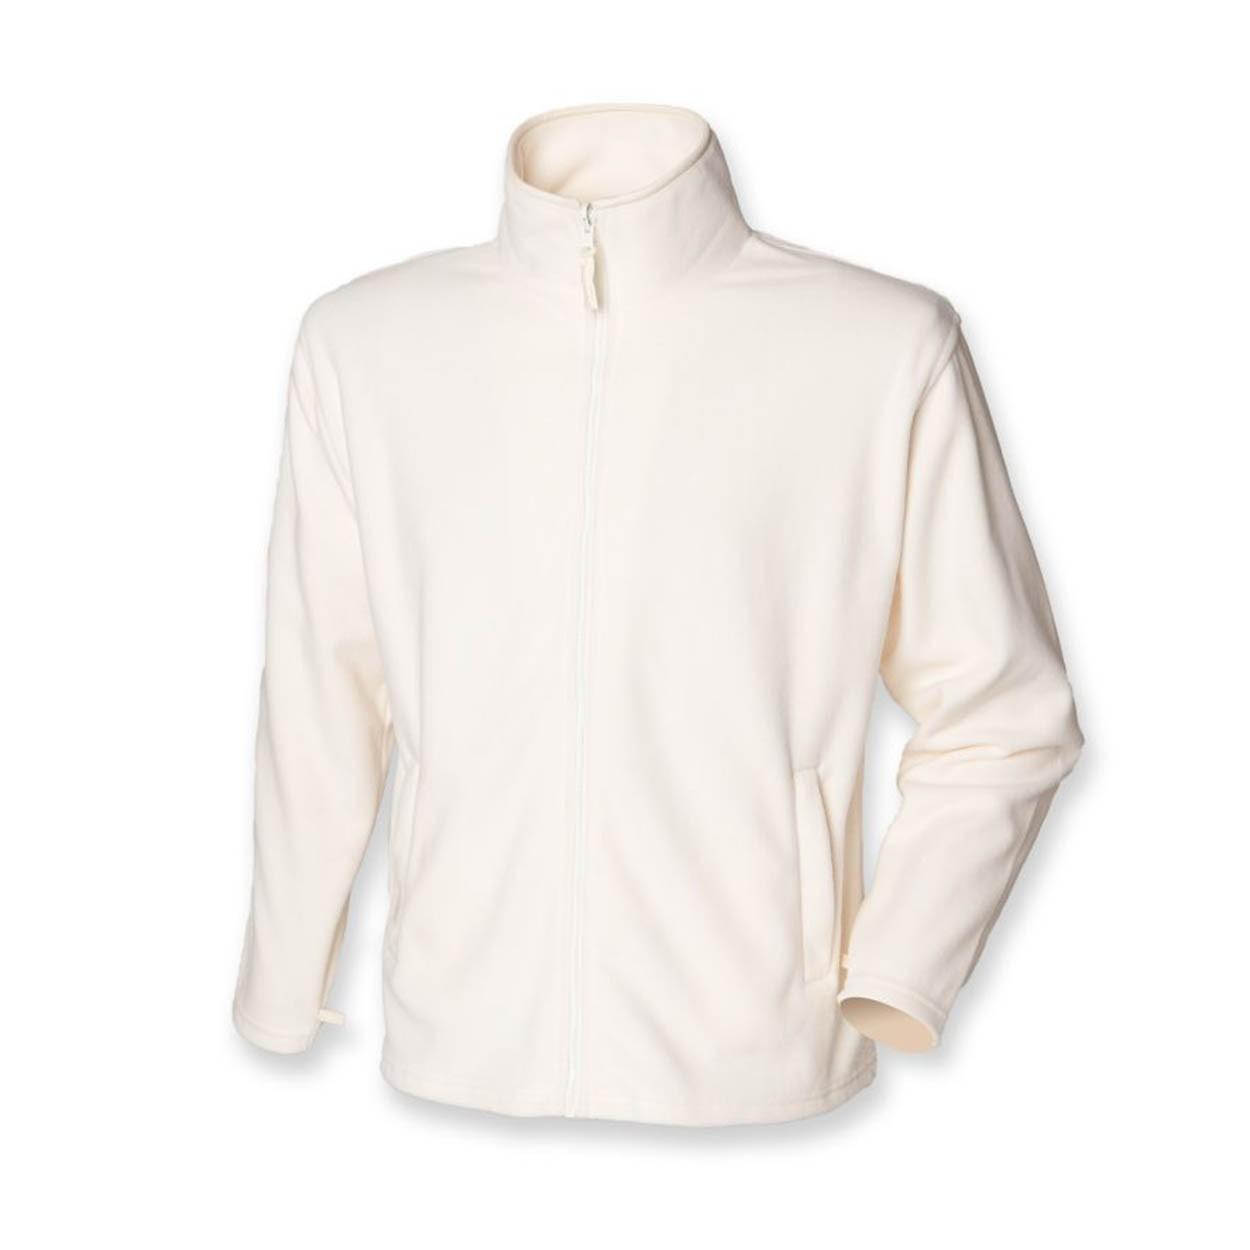 Henbury H850 Micro Fleece Jacket - Mens / Unisex Fleece Jackets ...